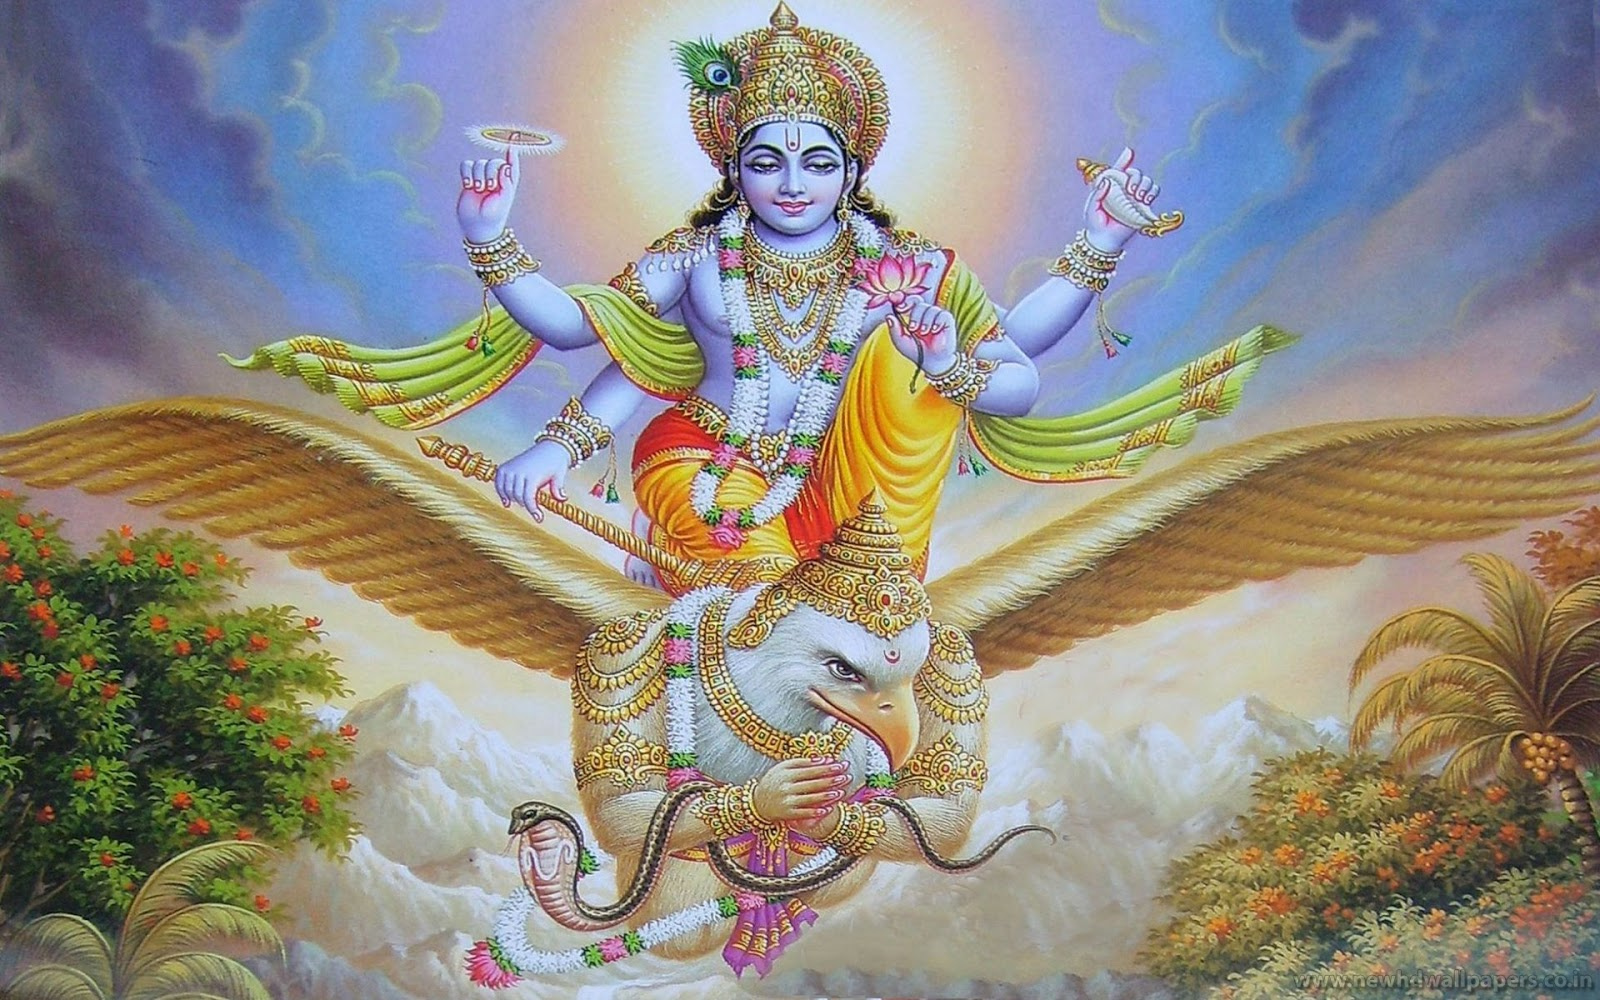 Hindu Gods Wallpaper For Desktop: Hindu Gods And Goddess [Great Wallpapers]